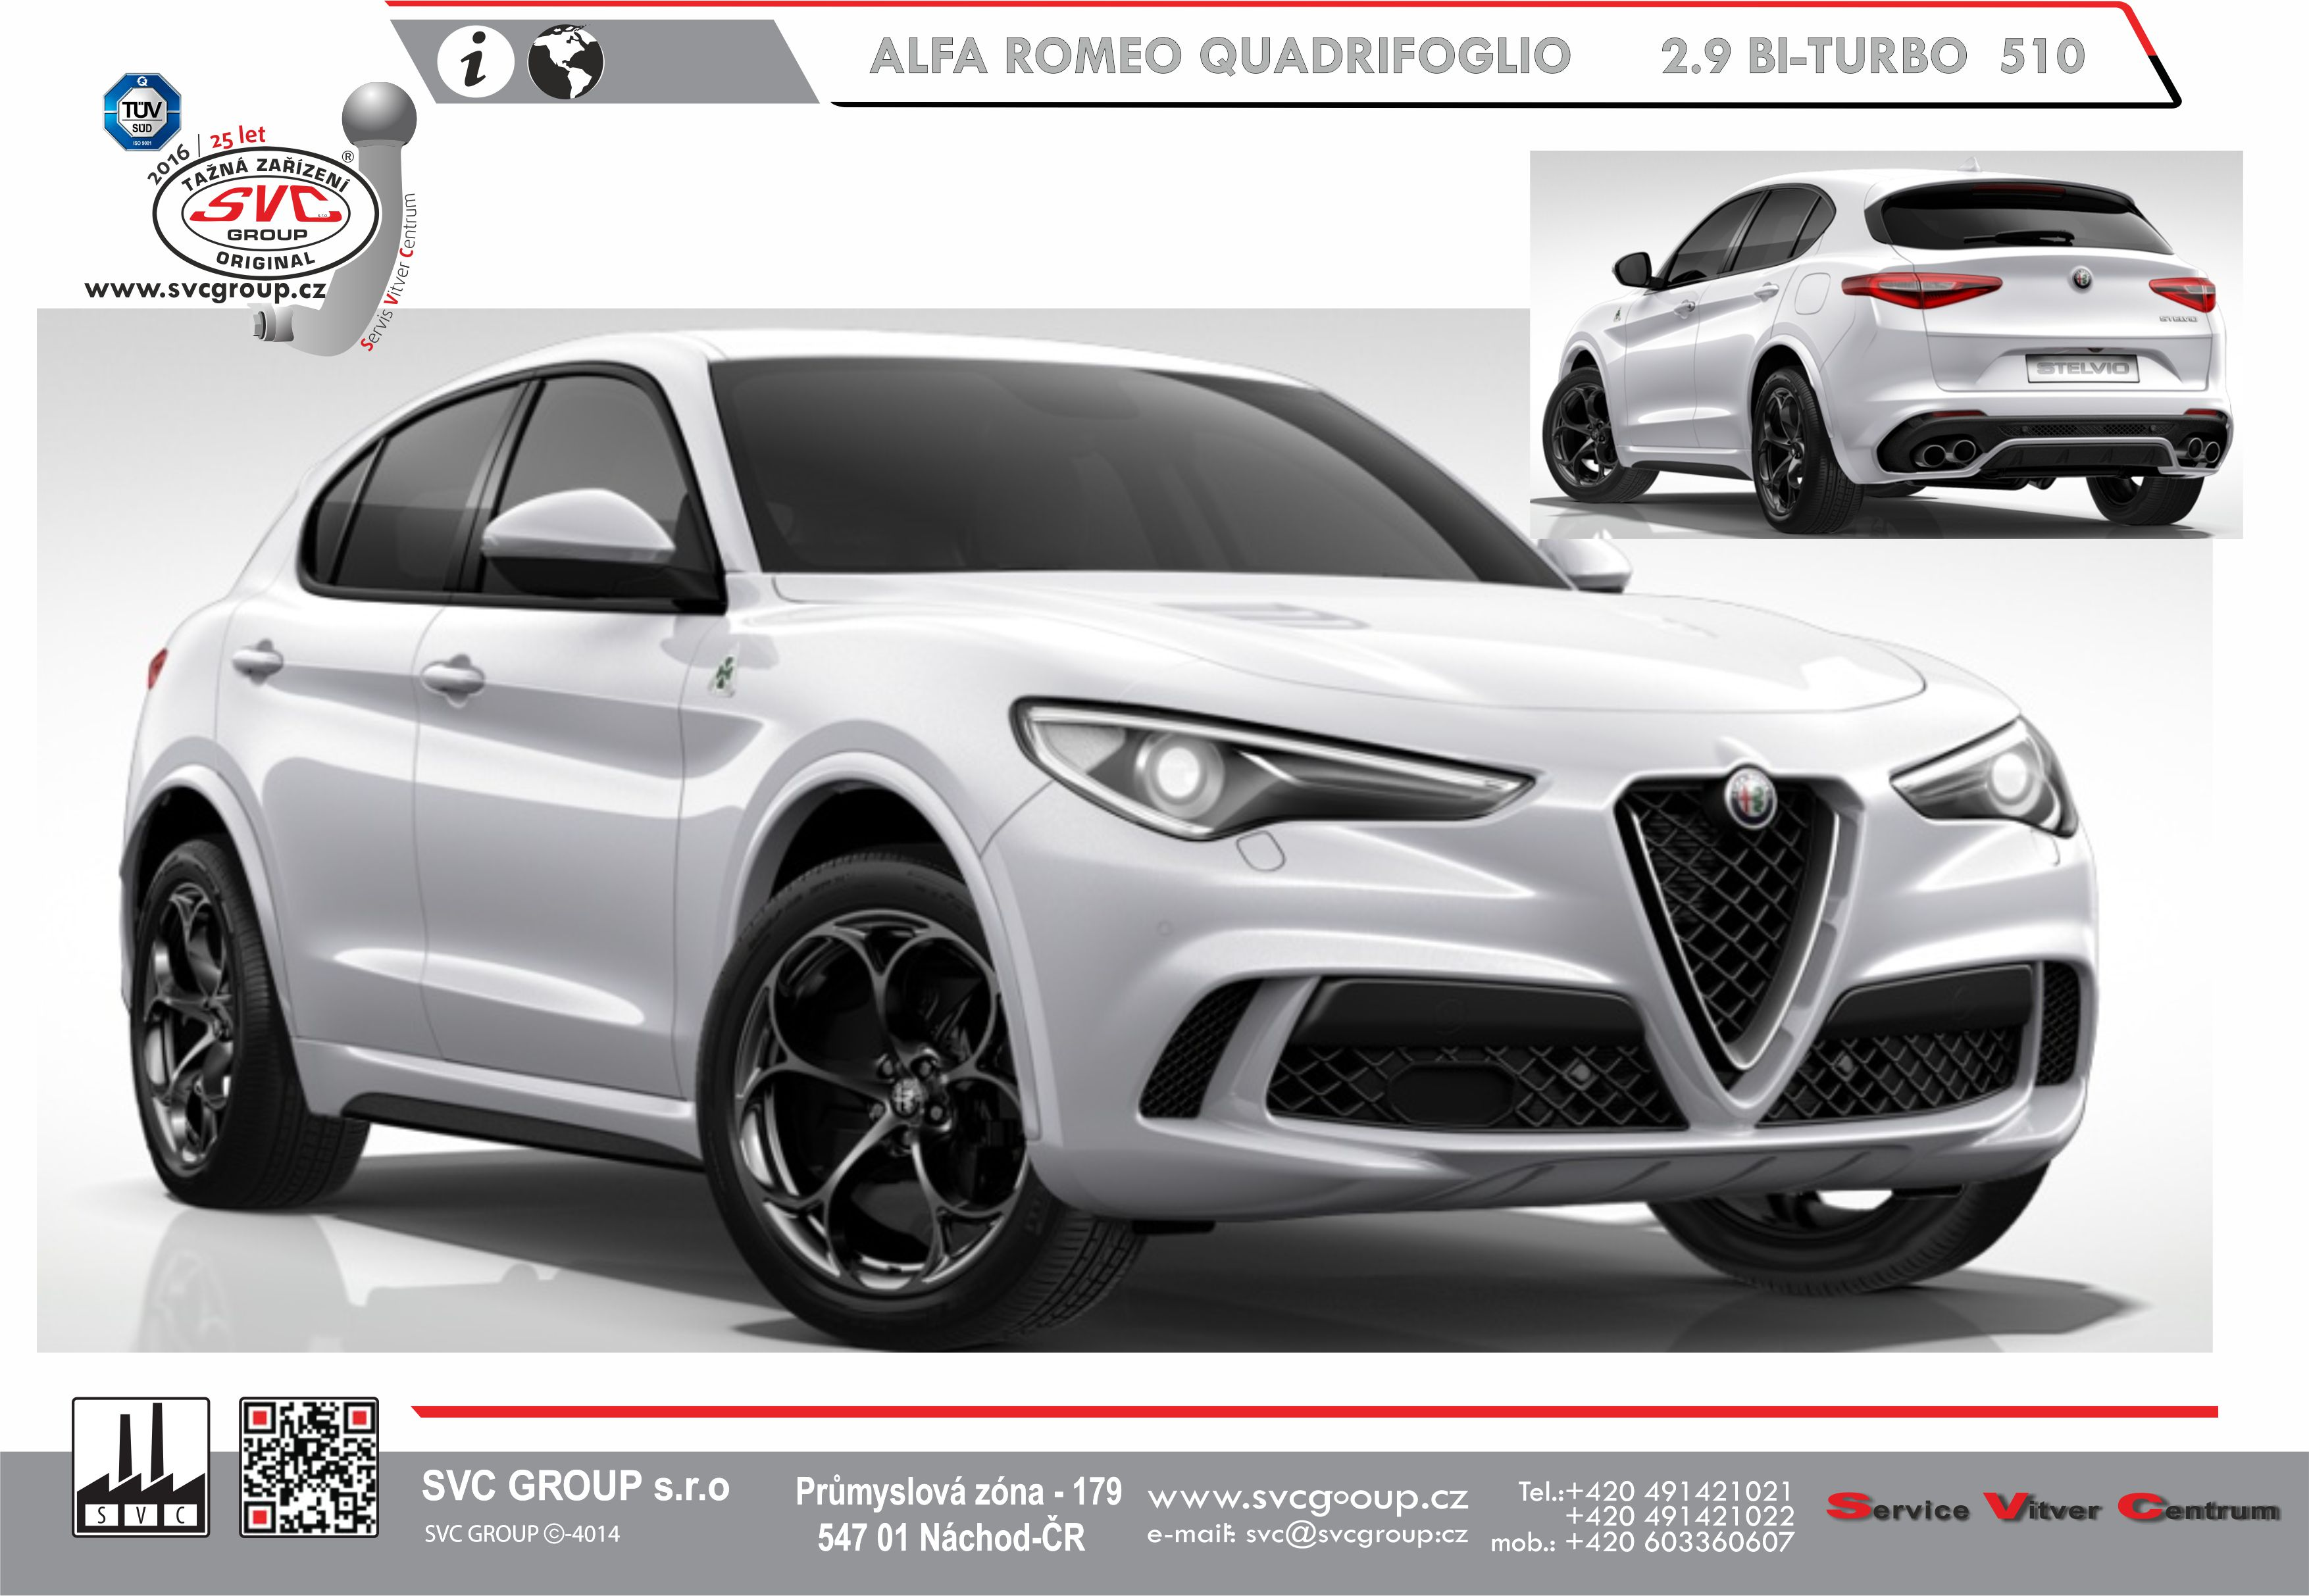 Alfa Romeo QUADRIFOGLIO 2.9 BI-TURBO 510 K